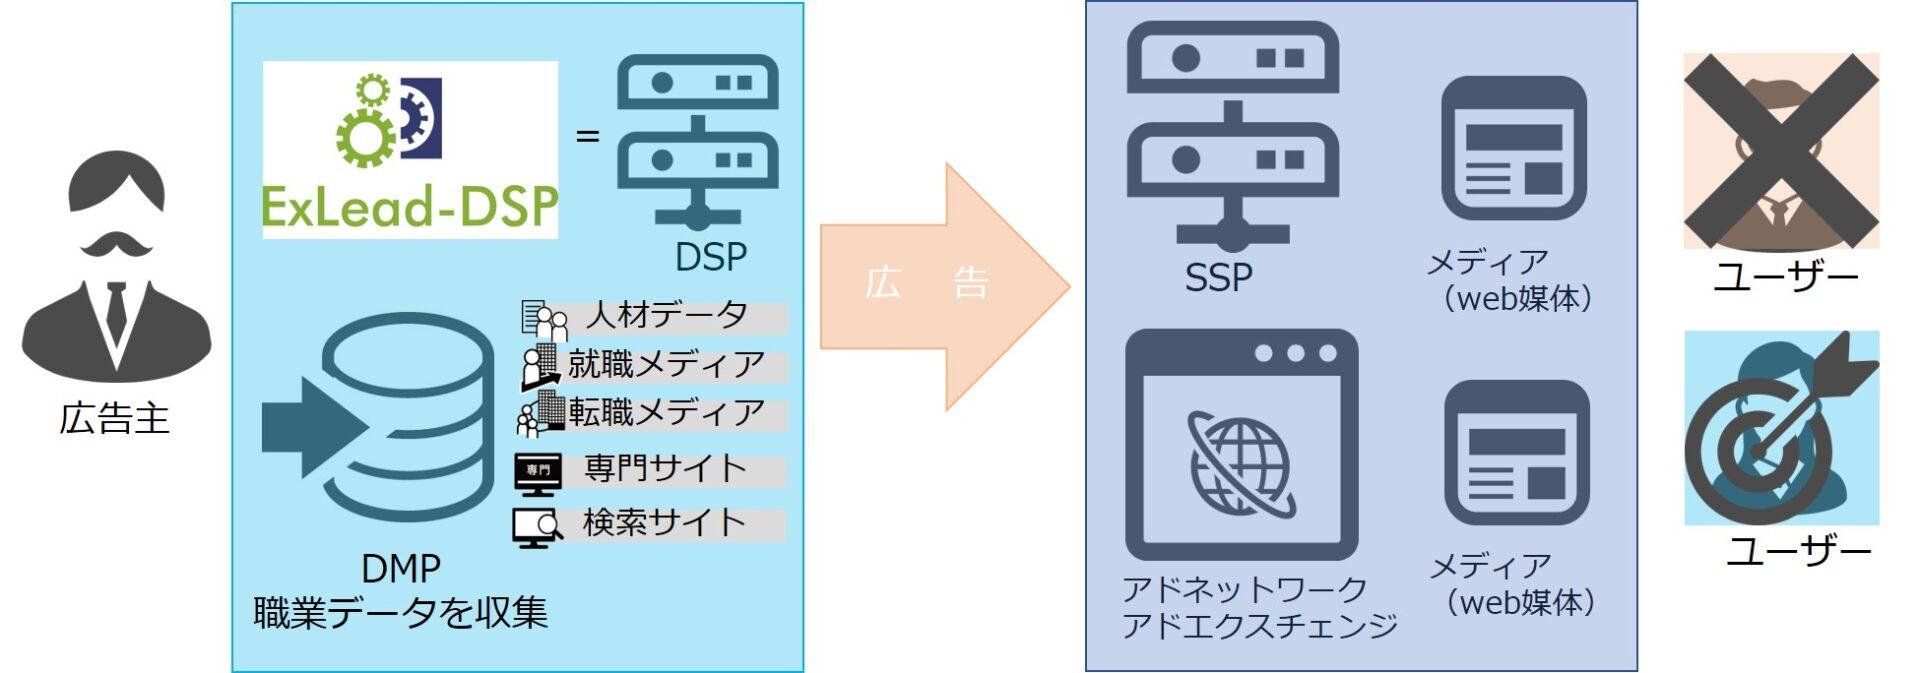 BtoB,マーケティング,メイテンス,DSP,アドテクノロジー,MAツール,アドテク,DSP,DMP,SSP,リマーケティング,リマーケティング,